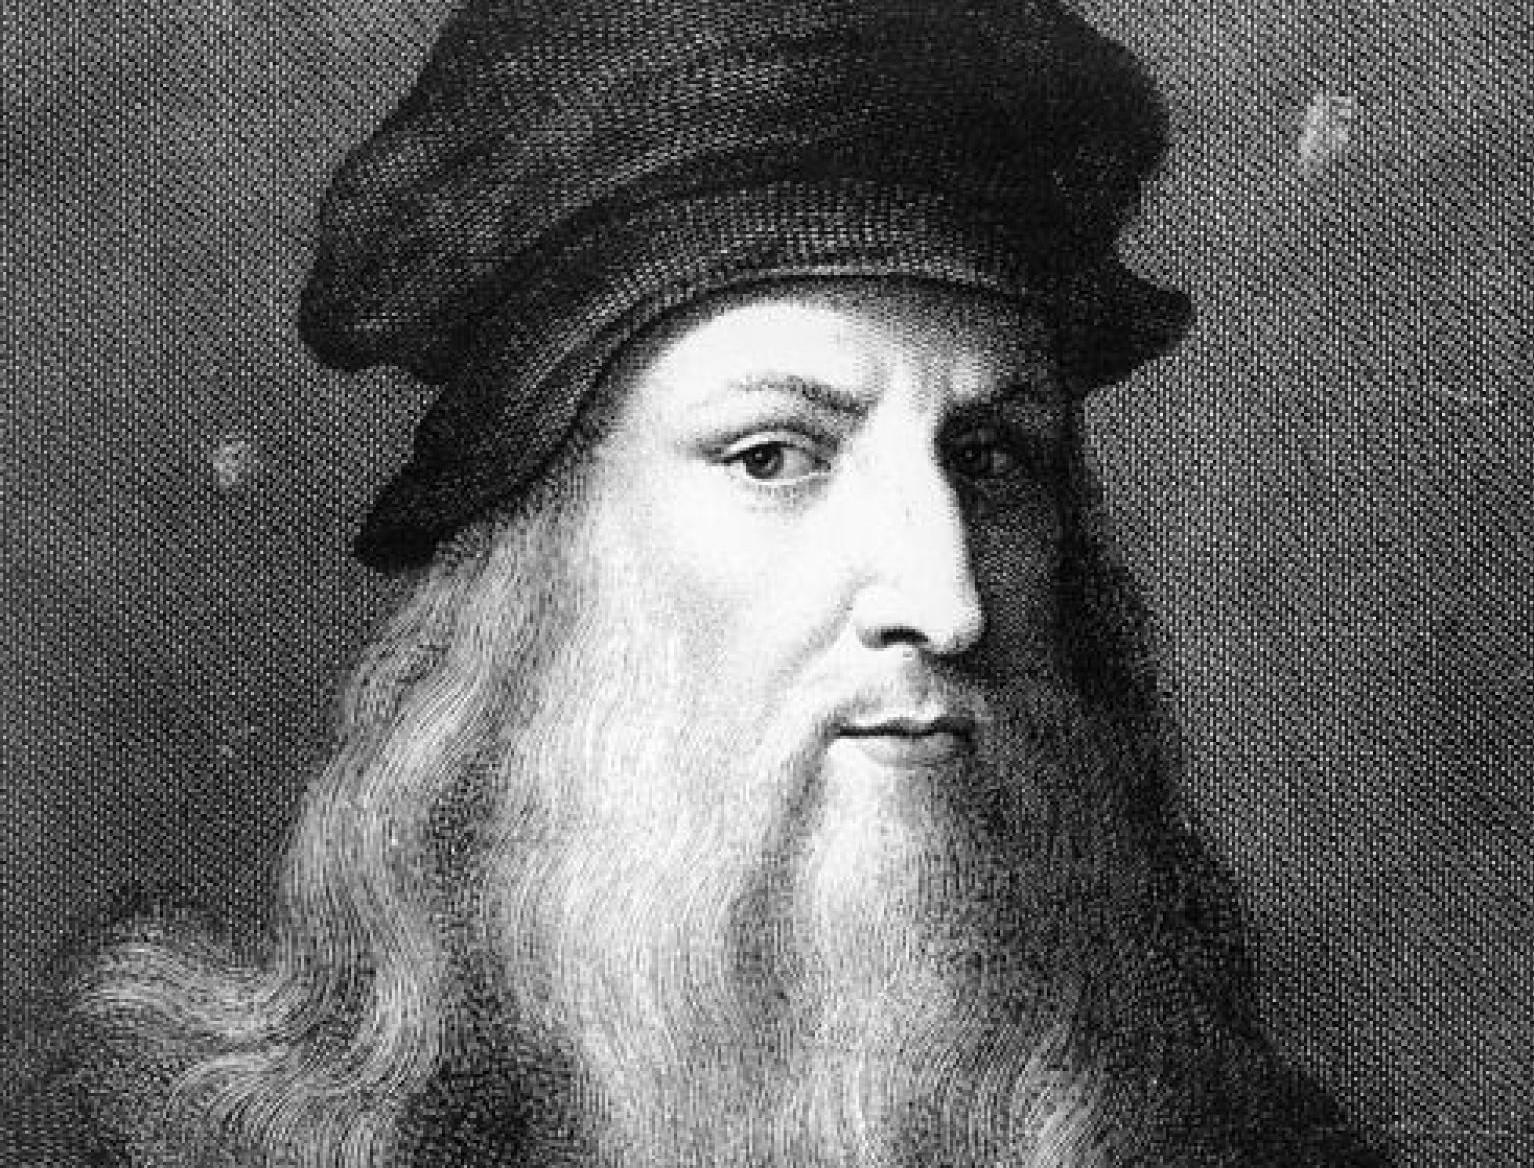 Leonardo Da Vinci had theories about eye surgery